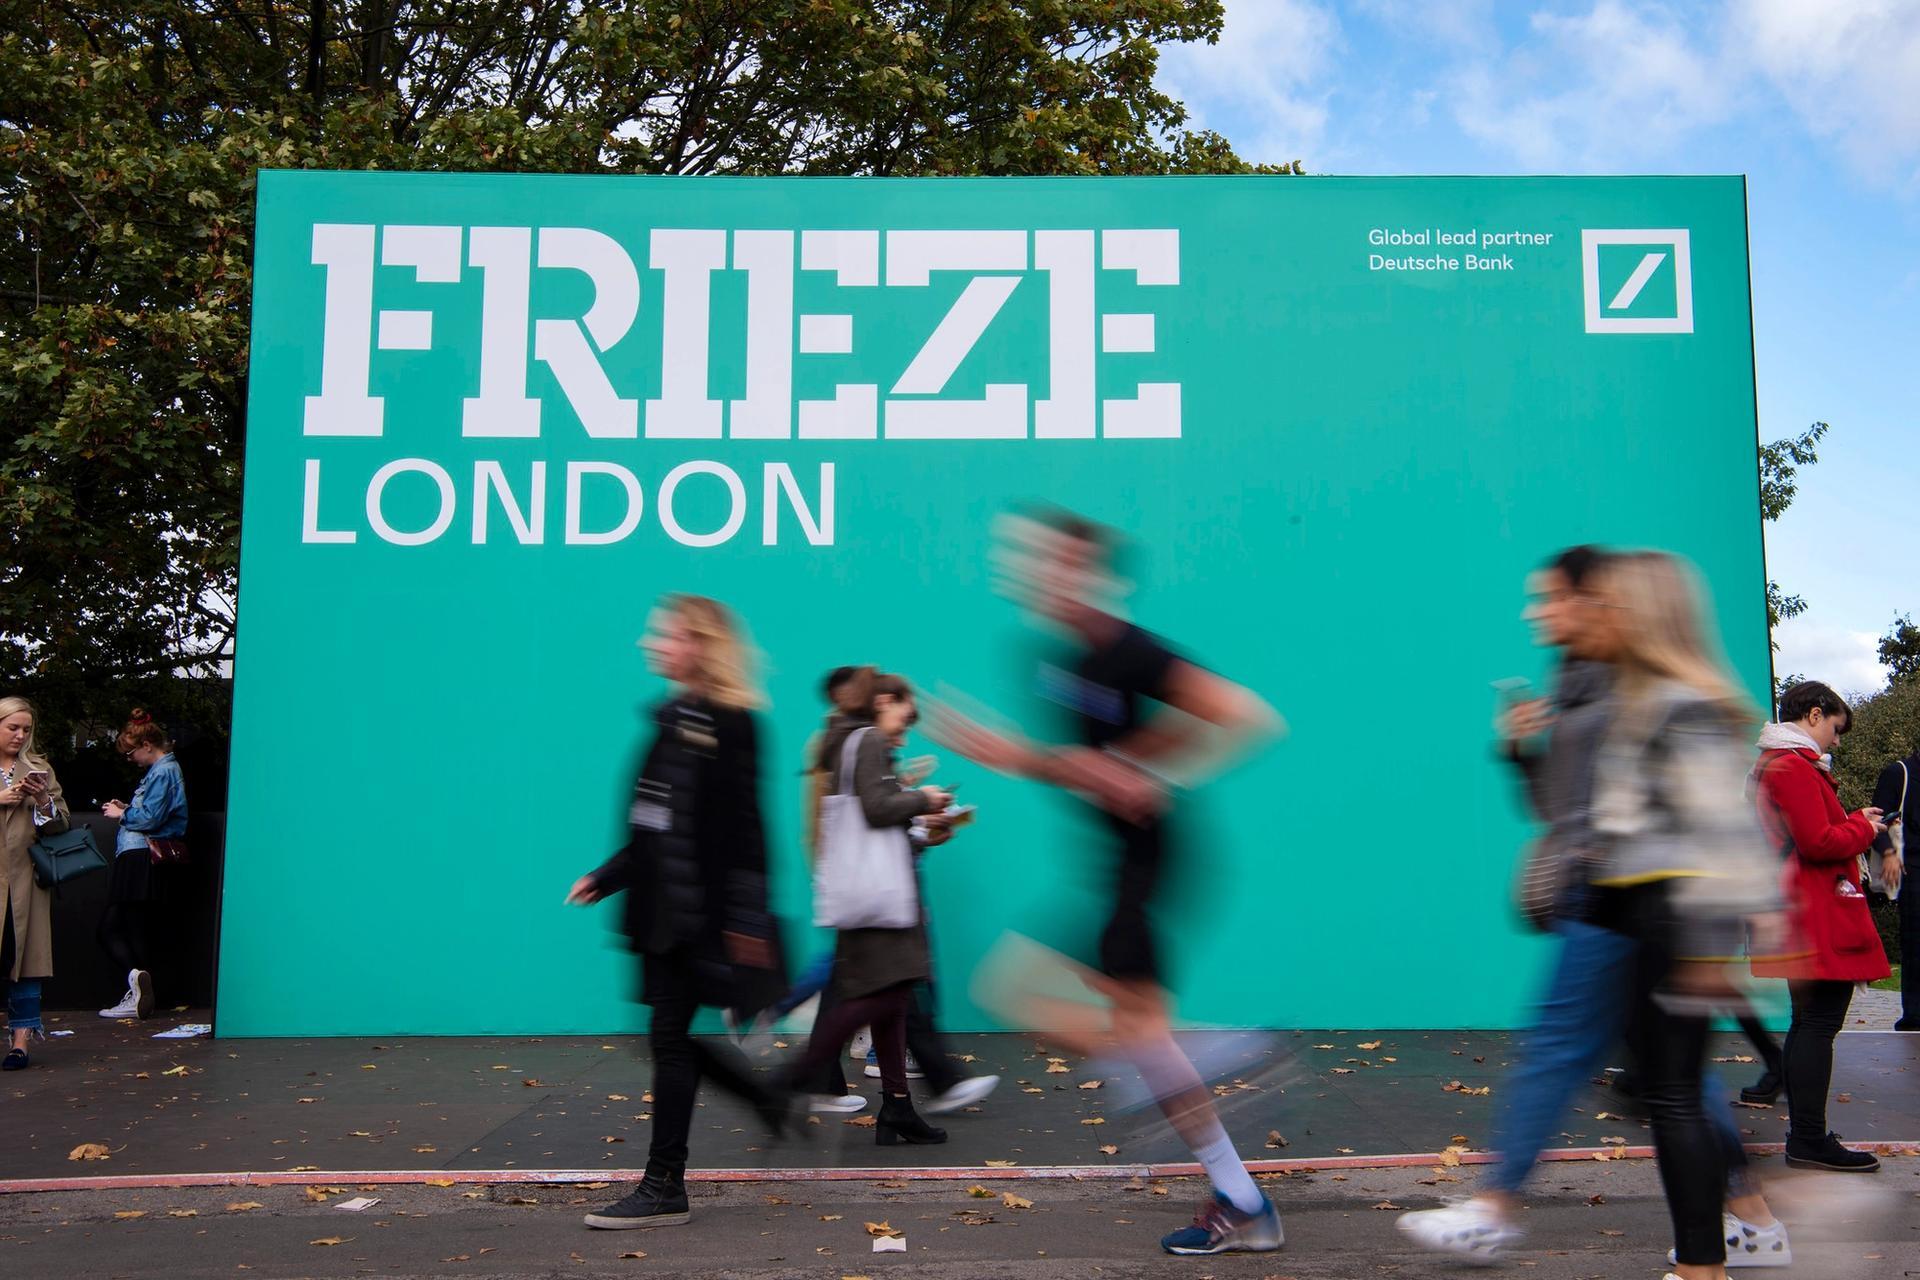 Frieze London and Frieze Masters 2020 have been cancelled Photo by Linda Nylind. Courtesy of Linda Nylind/Frieze